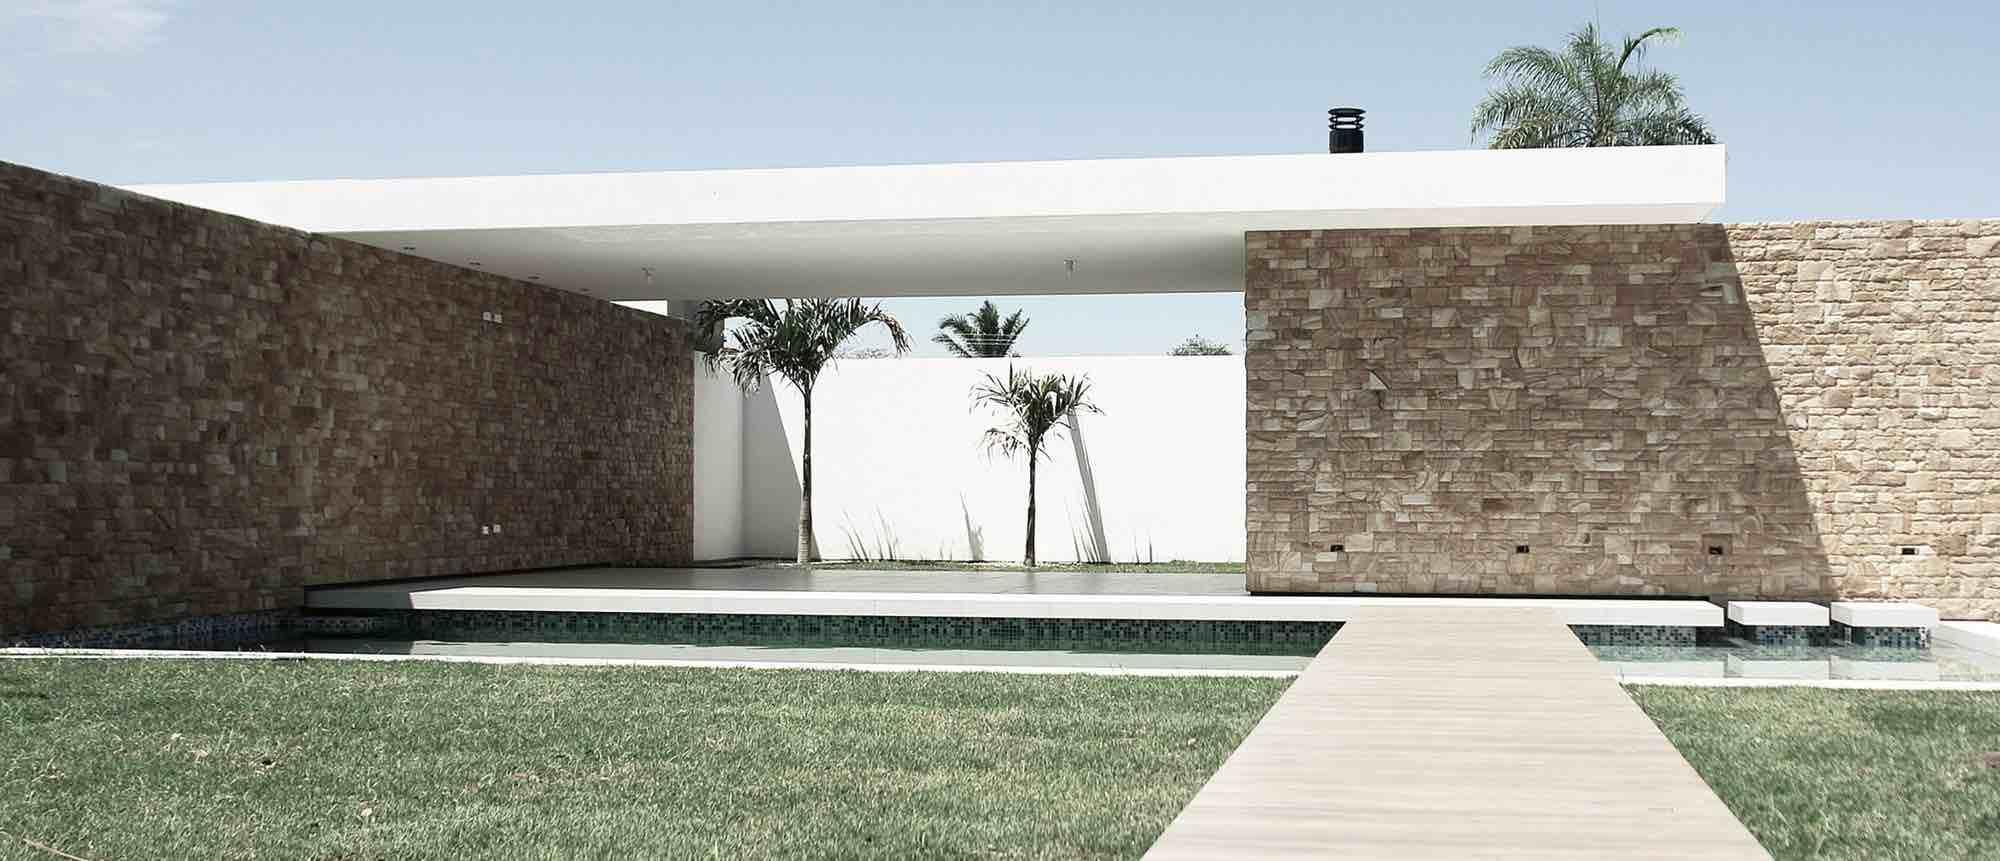 c-house-sommet-asociados_08